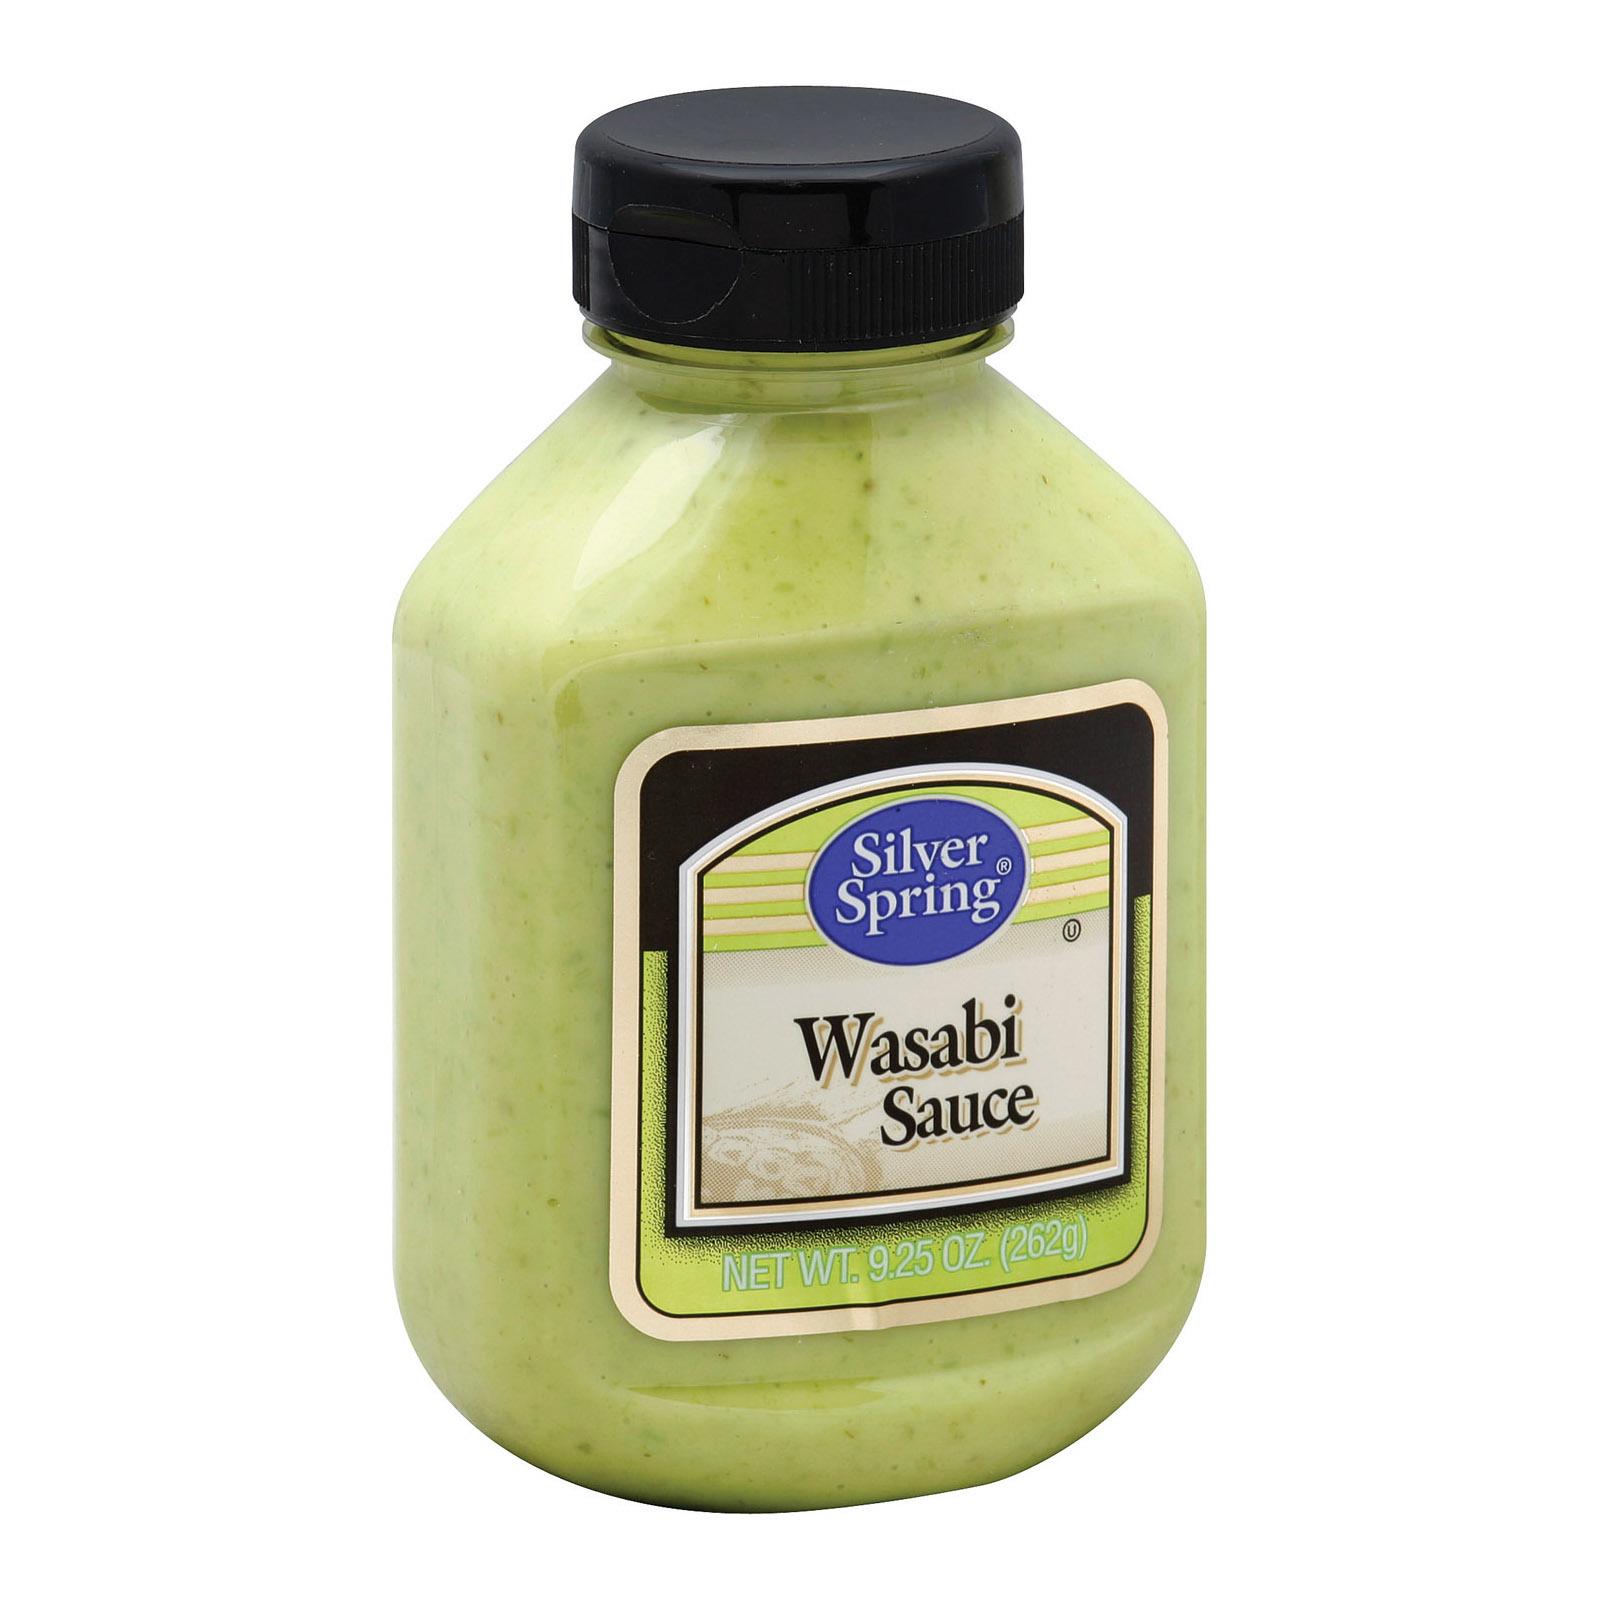 Silver Spring Sauce - Wasabi - Case of 9 - 9.25 fl oz